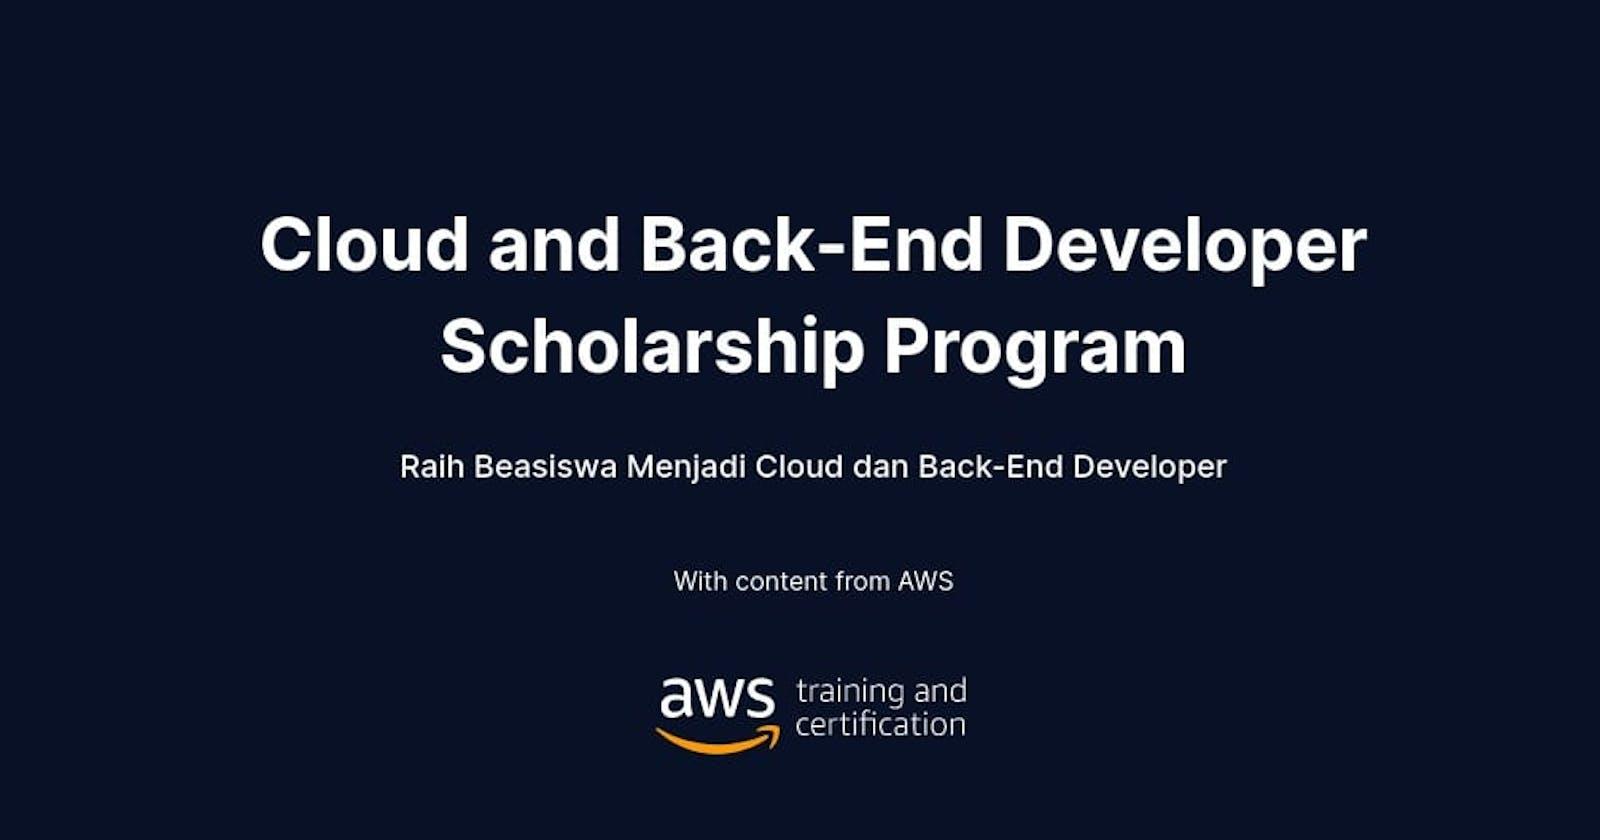 Dicoding x AWS Cloud and Back-End Developer Scholarship Program